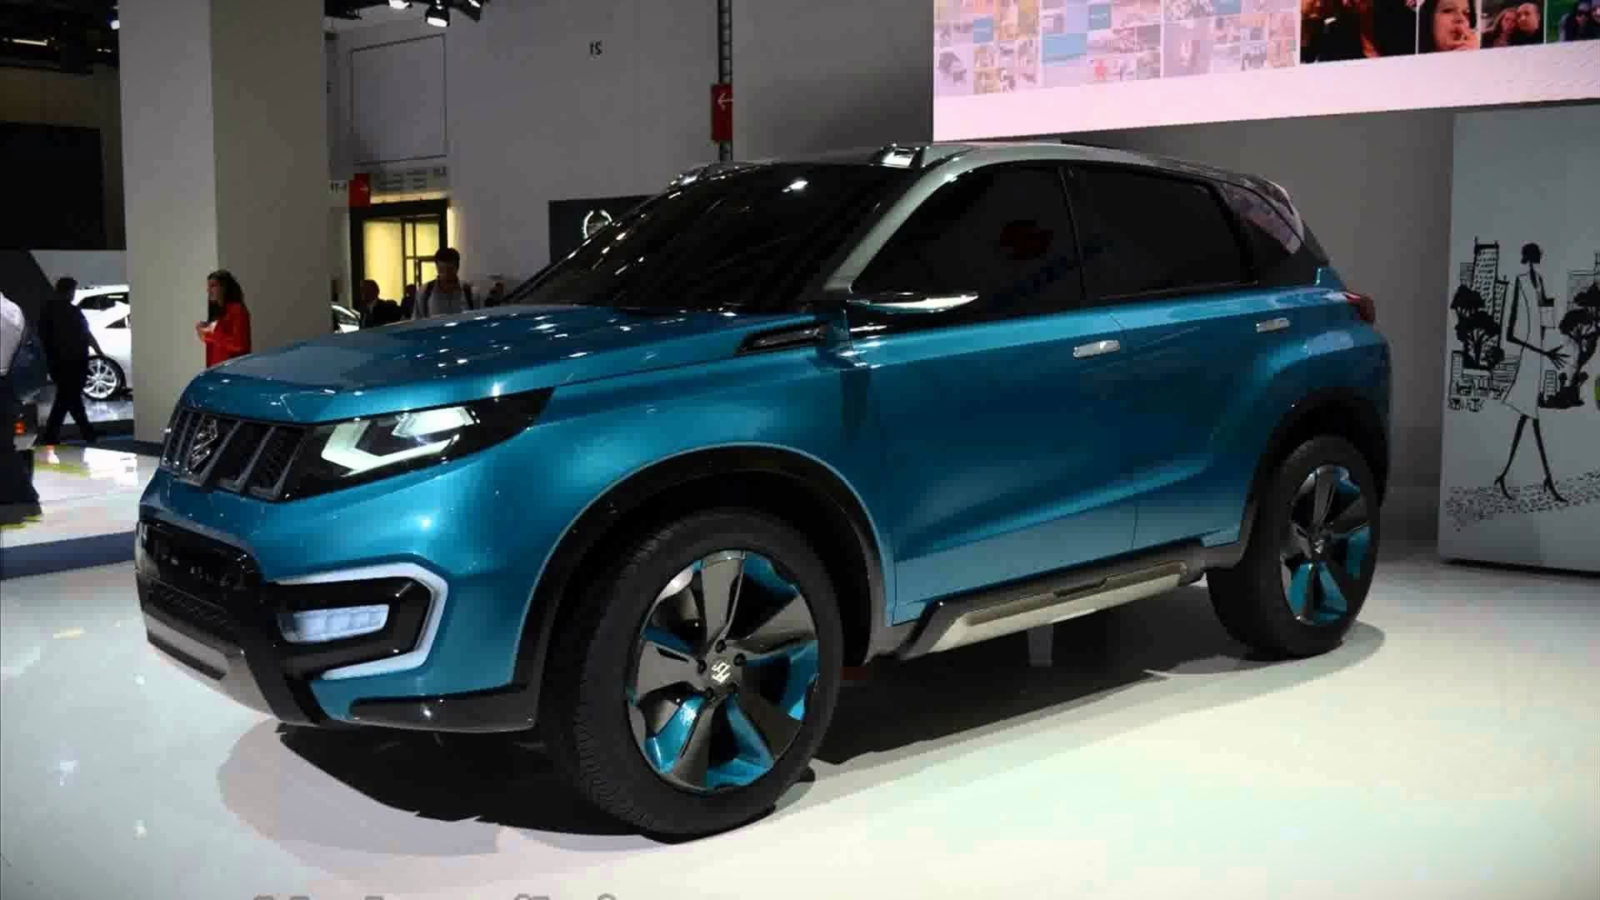 Suzuki Grand Vitara 2020 foto, jekster'er, vneshnij vid, vid sboku, obzor, cena, data vyhoda — video